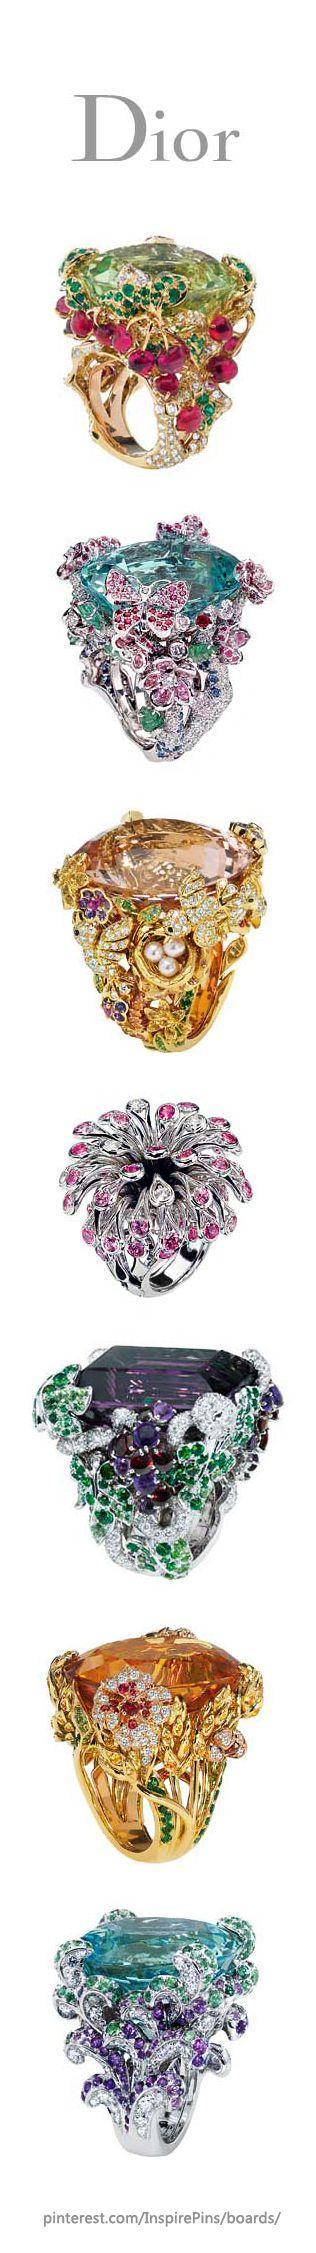 Wedding - Dior Joaillerie Rings